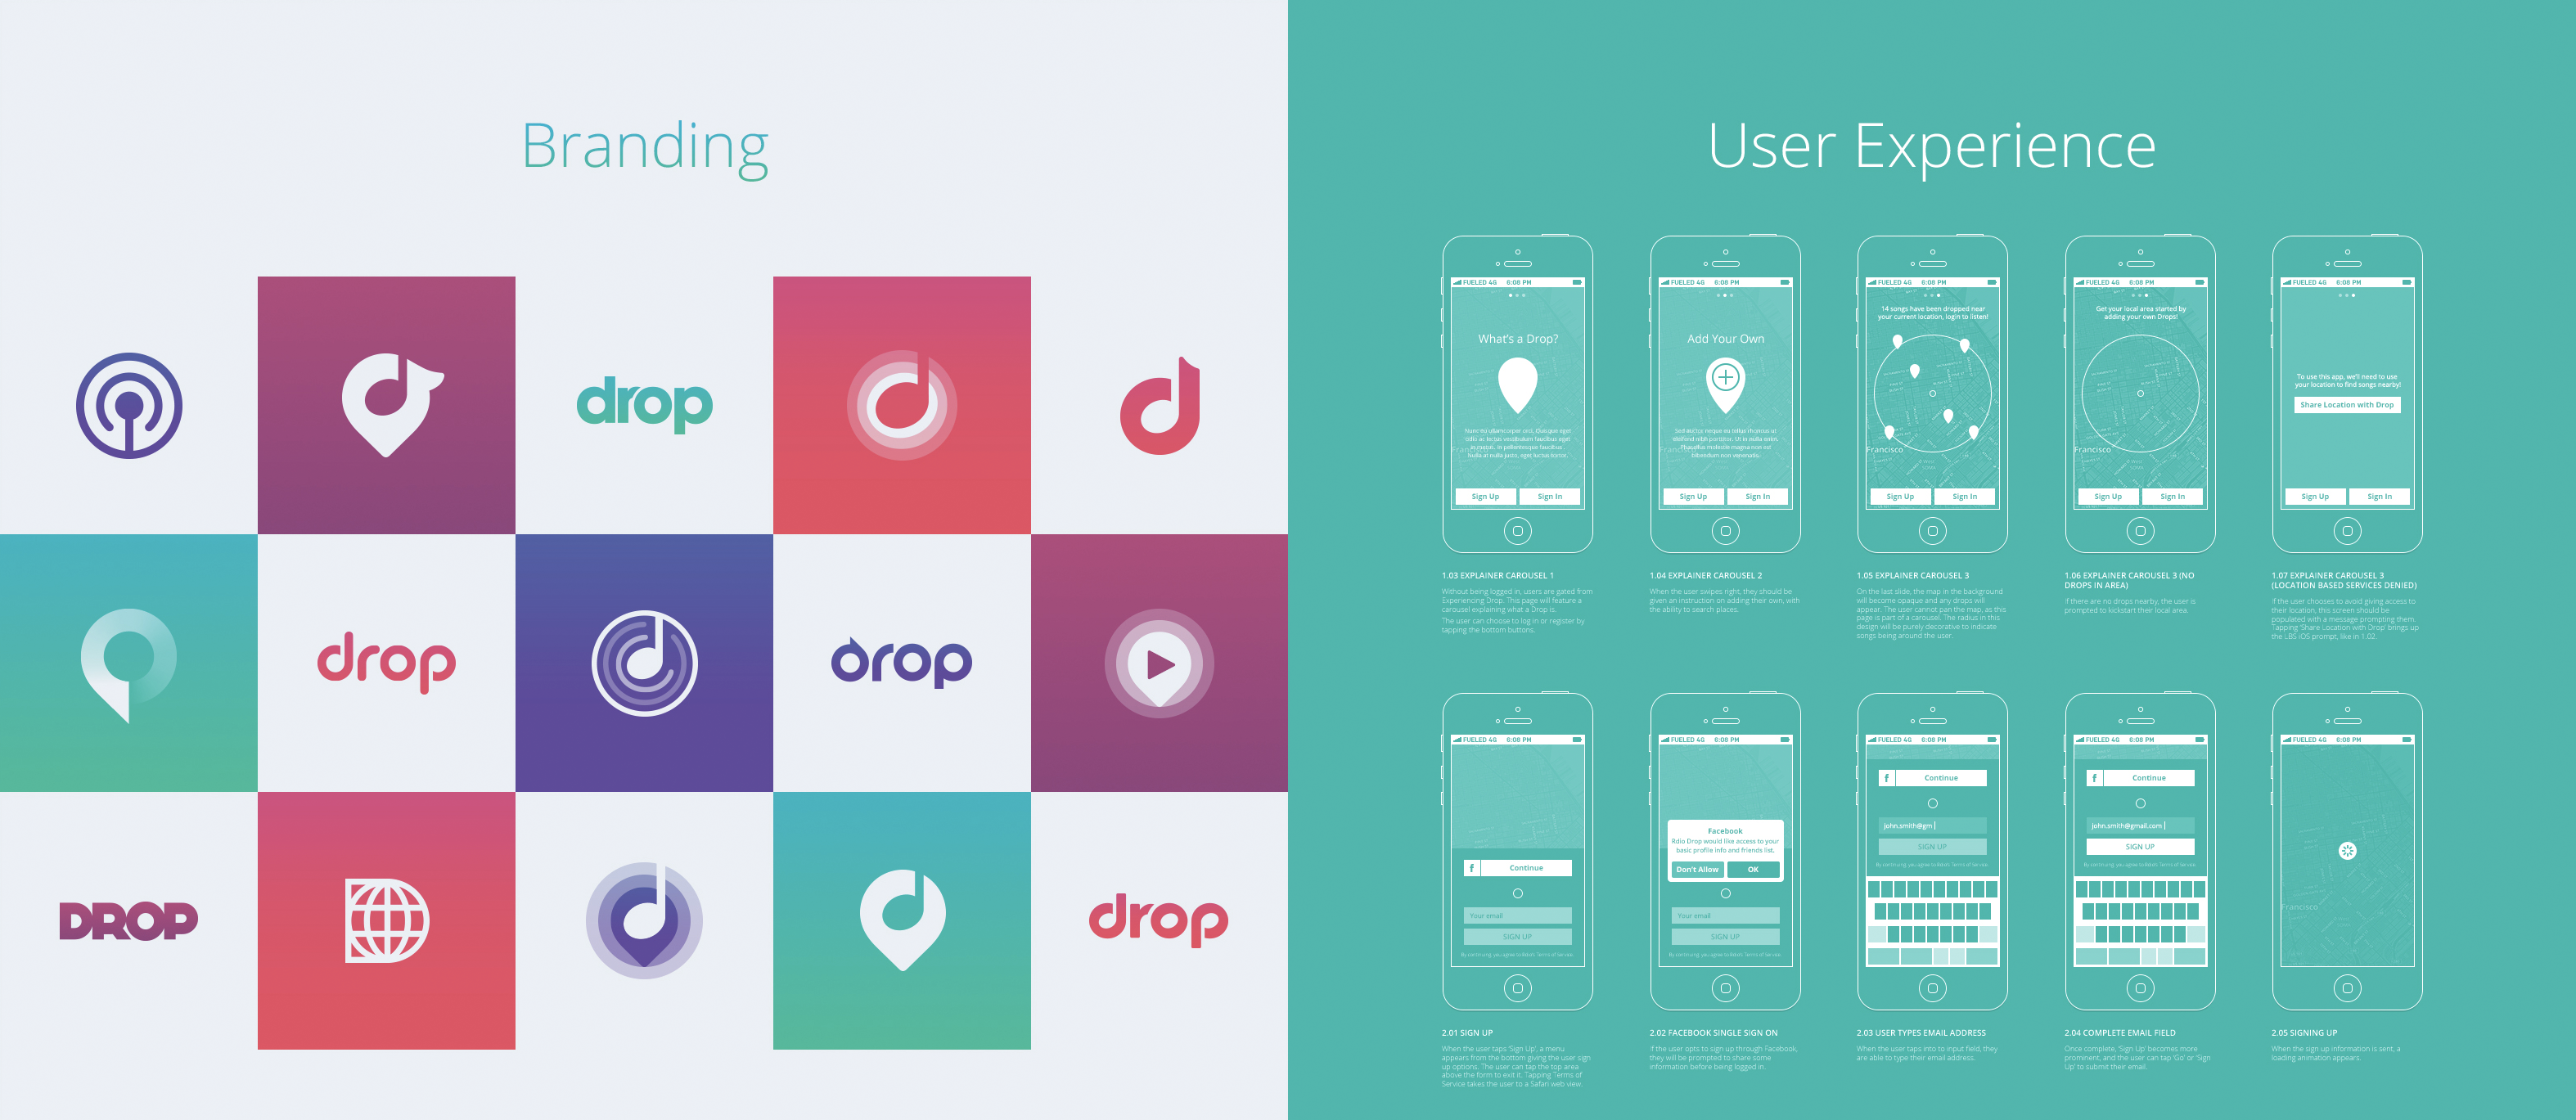 Enterprise-User-Experience Enterprise App Development